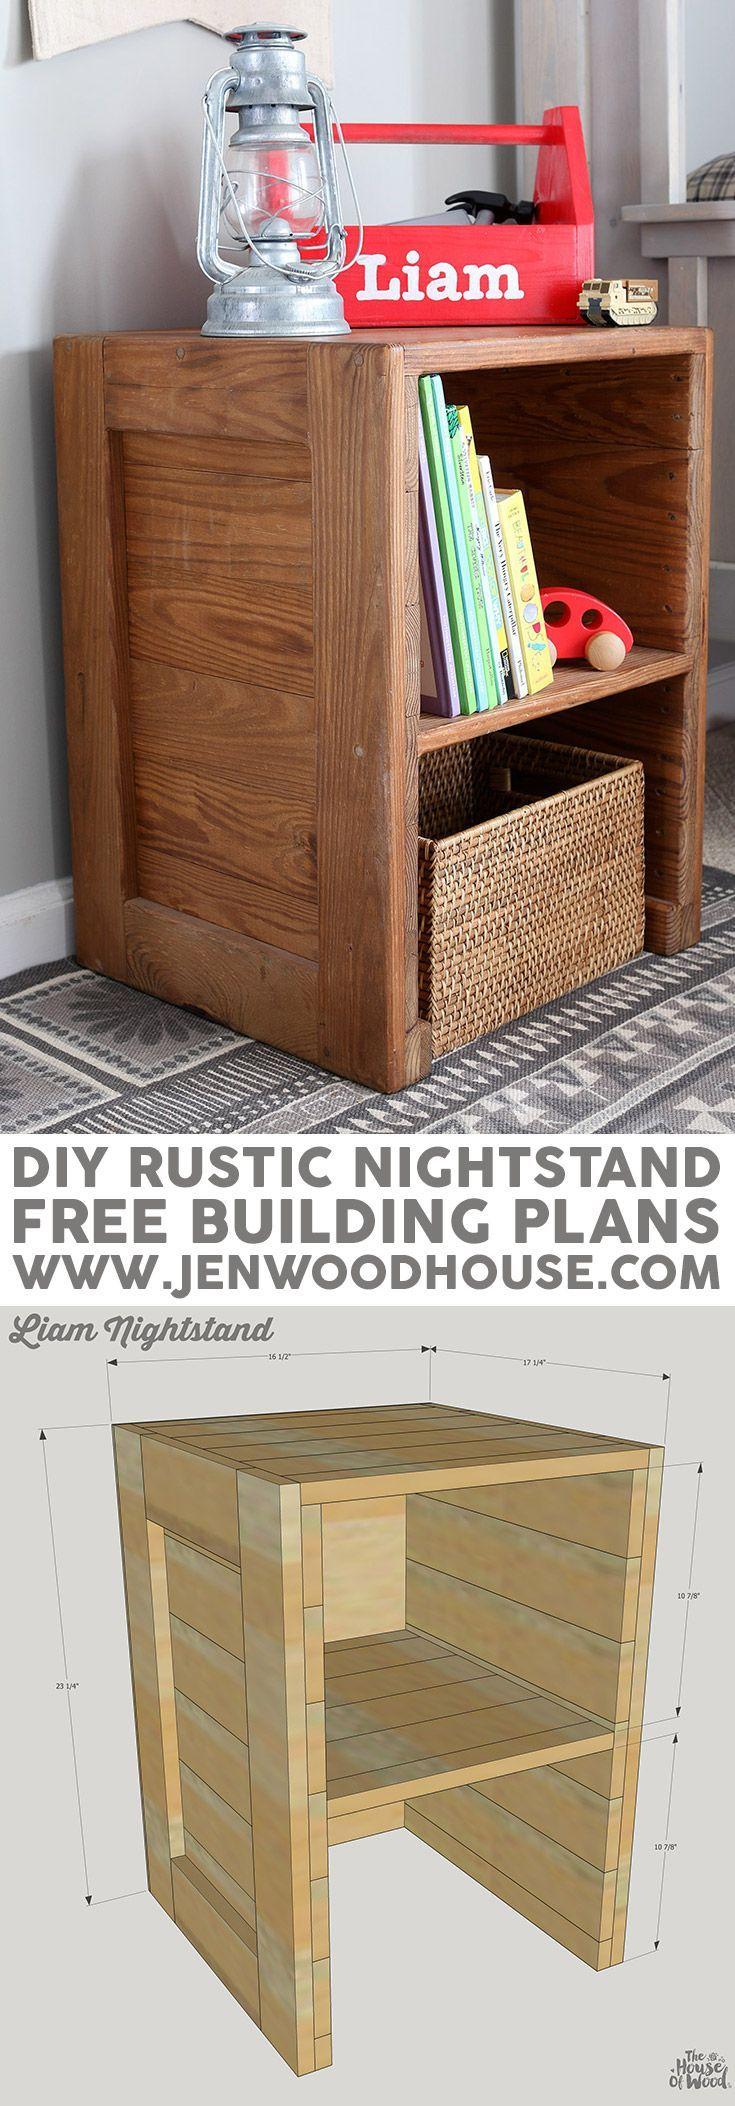 Free Plans DIY Rustic Nightstand Building plans Nightstands